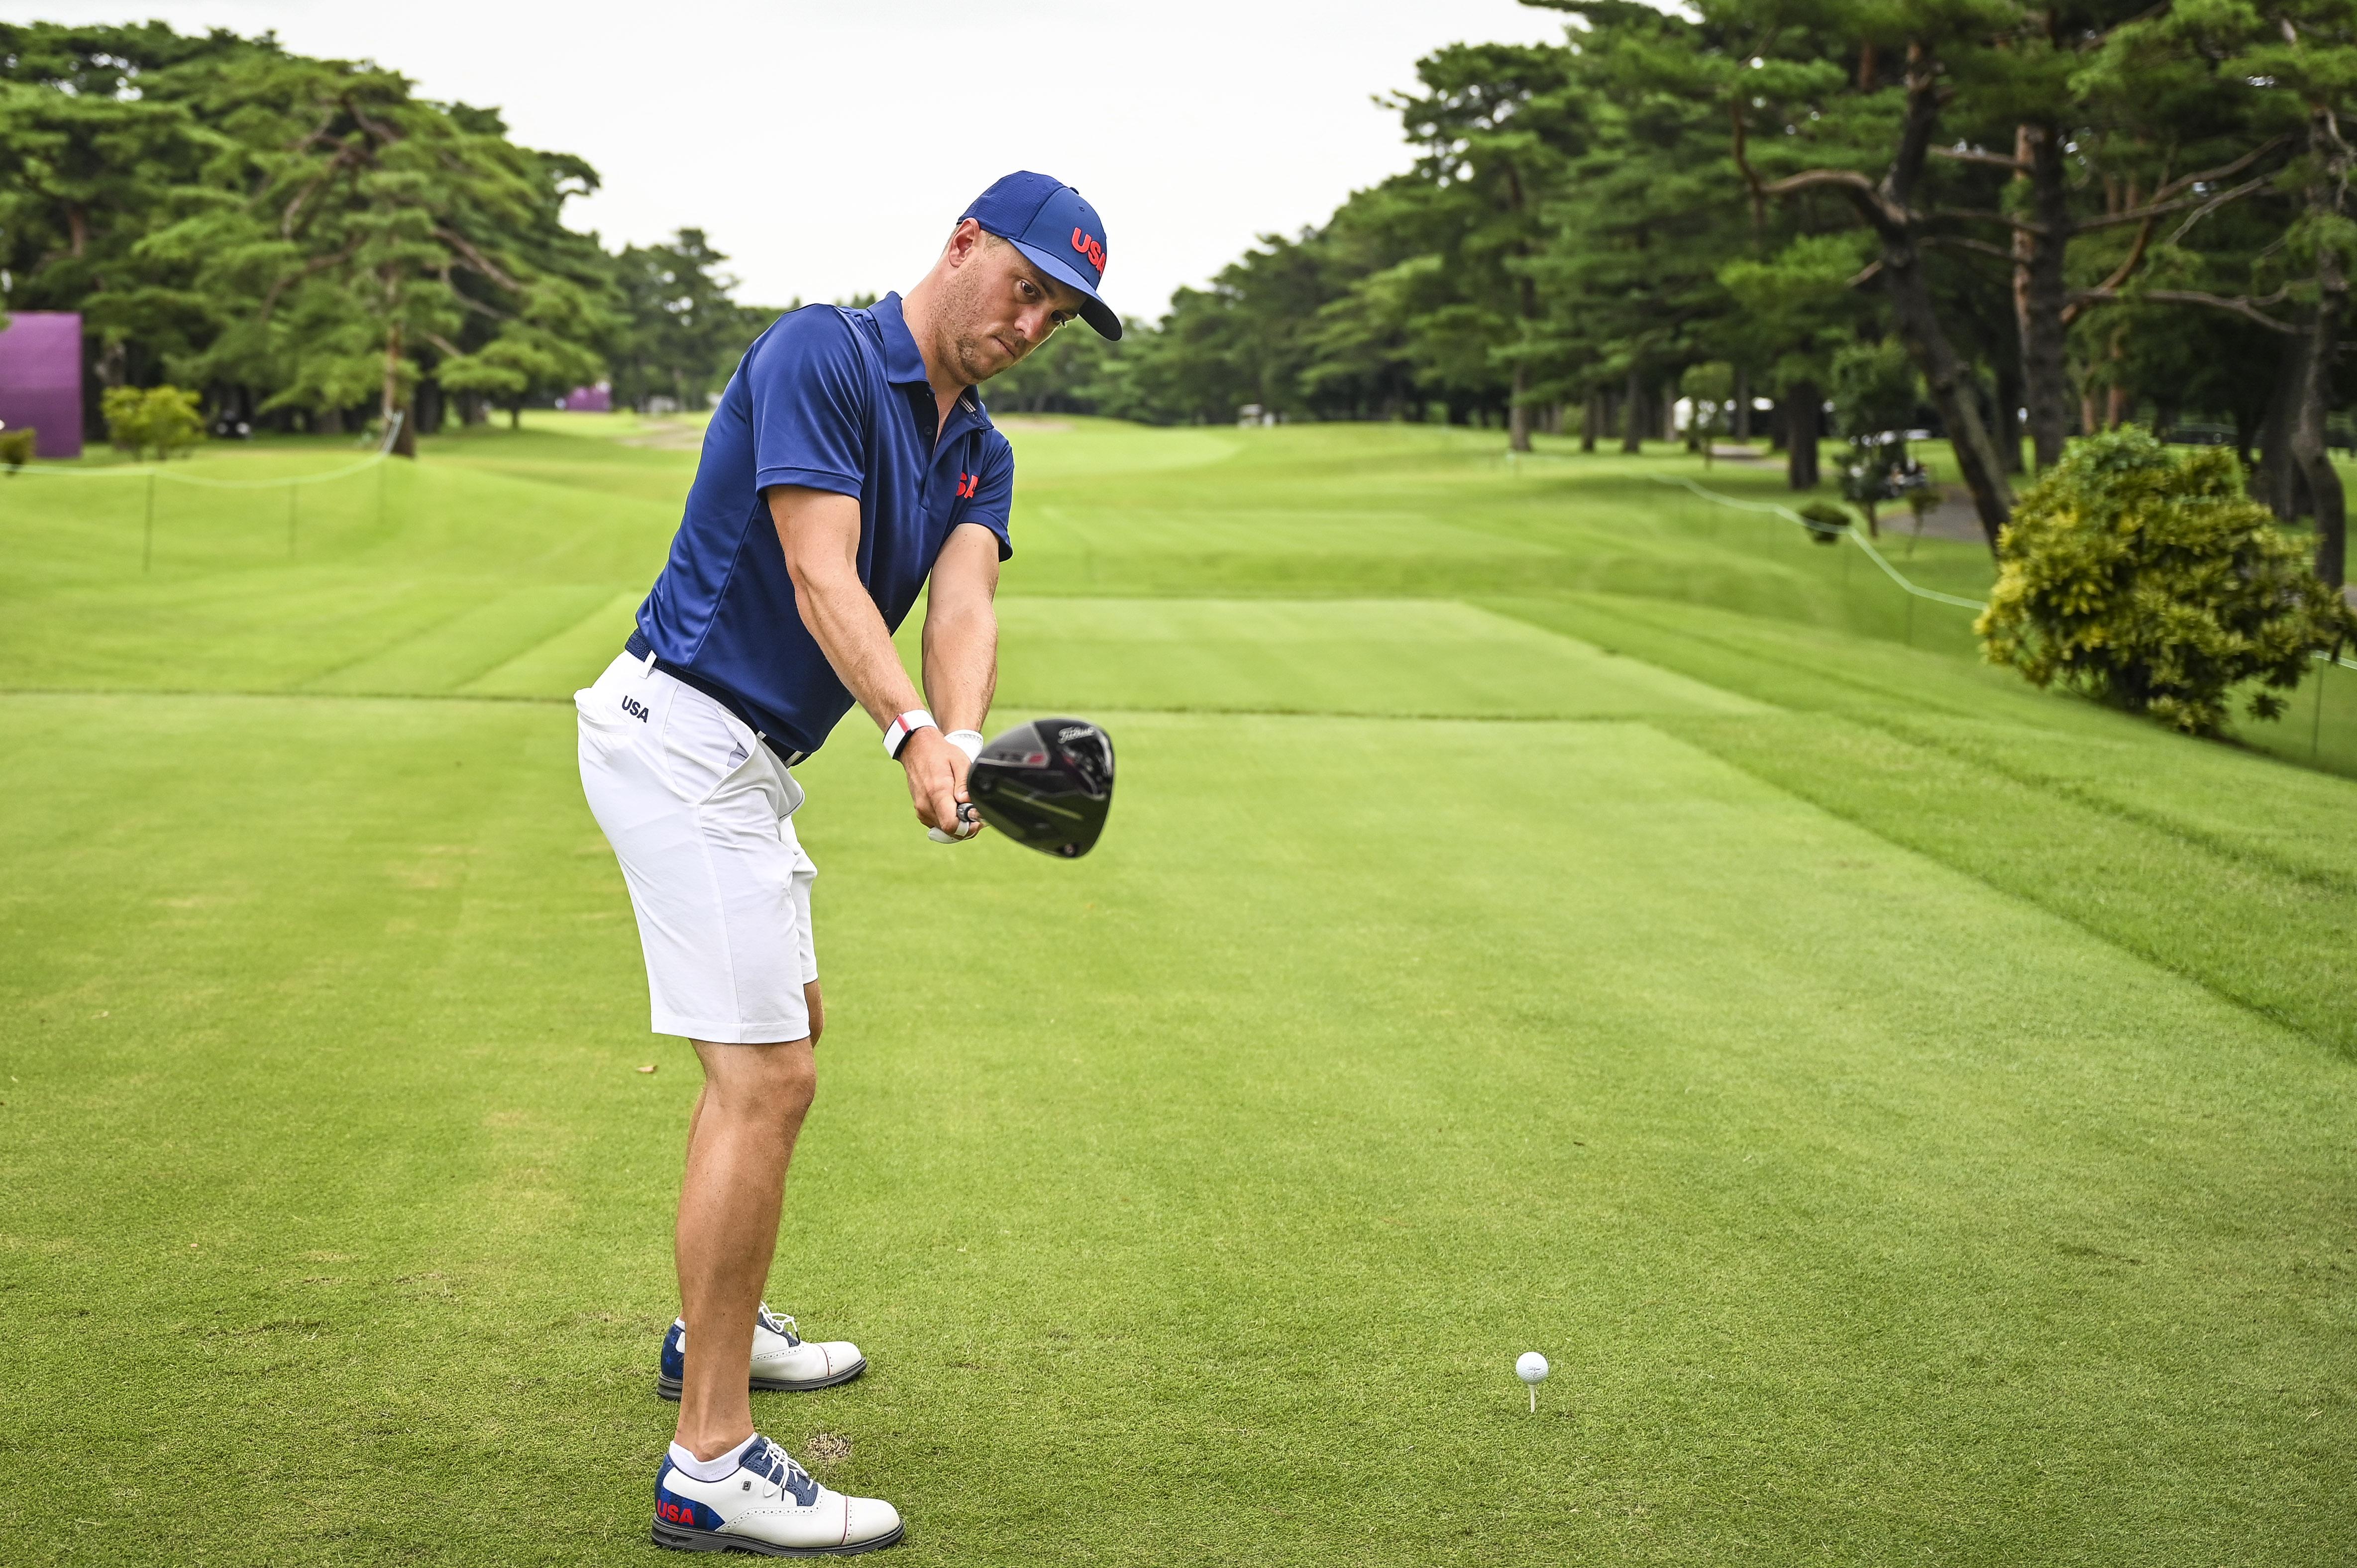 Golf - Olympics: Day 4